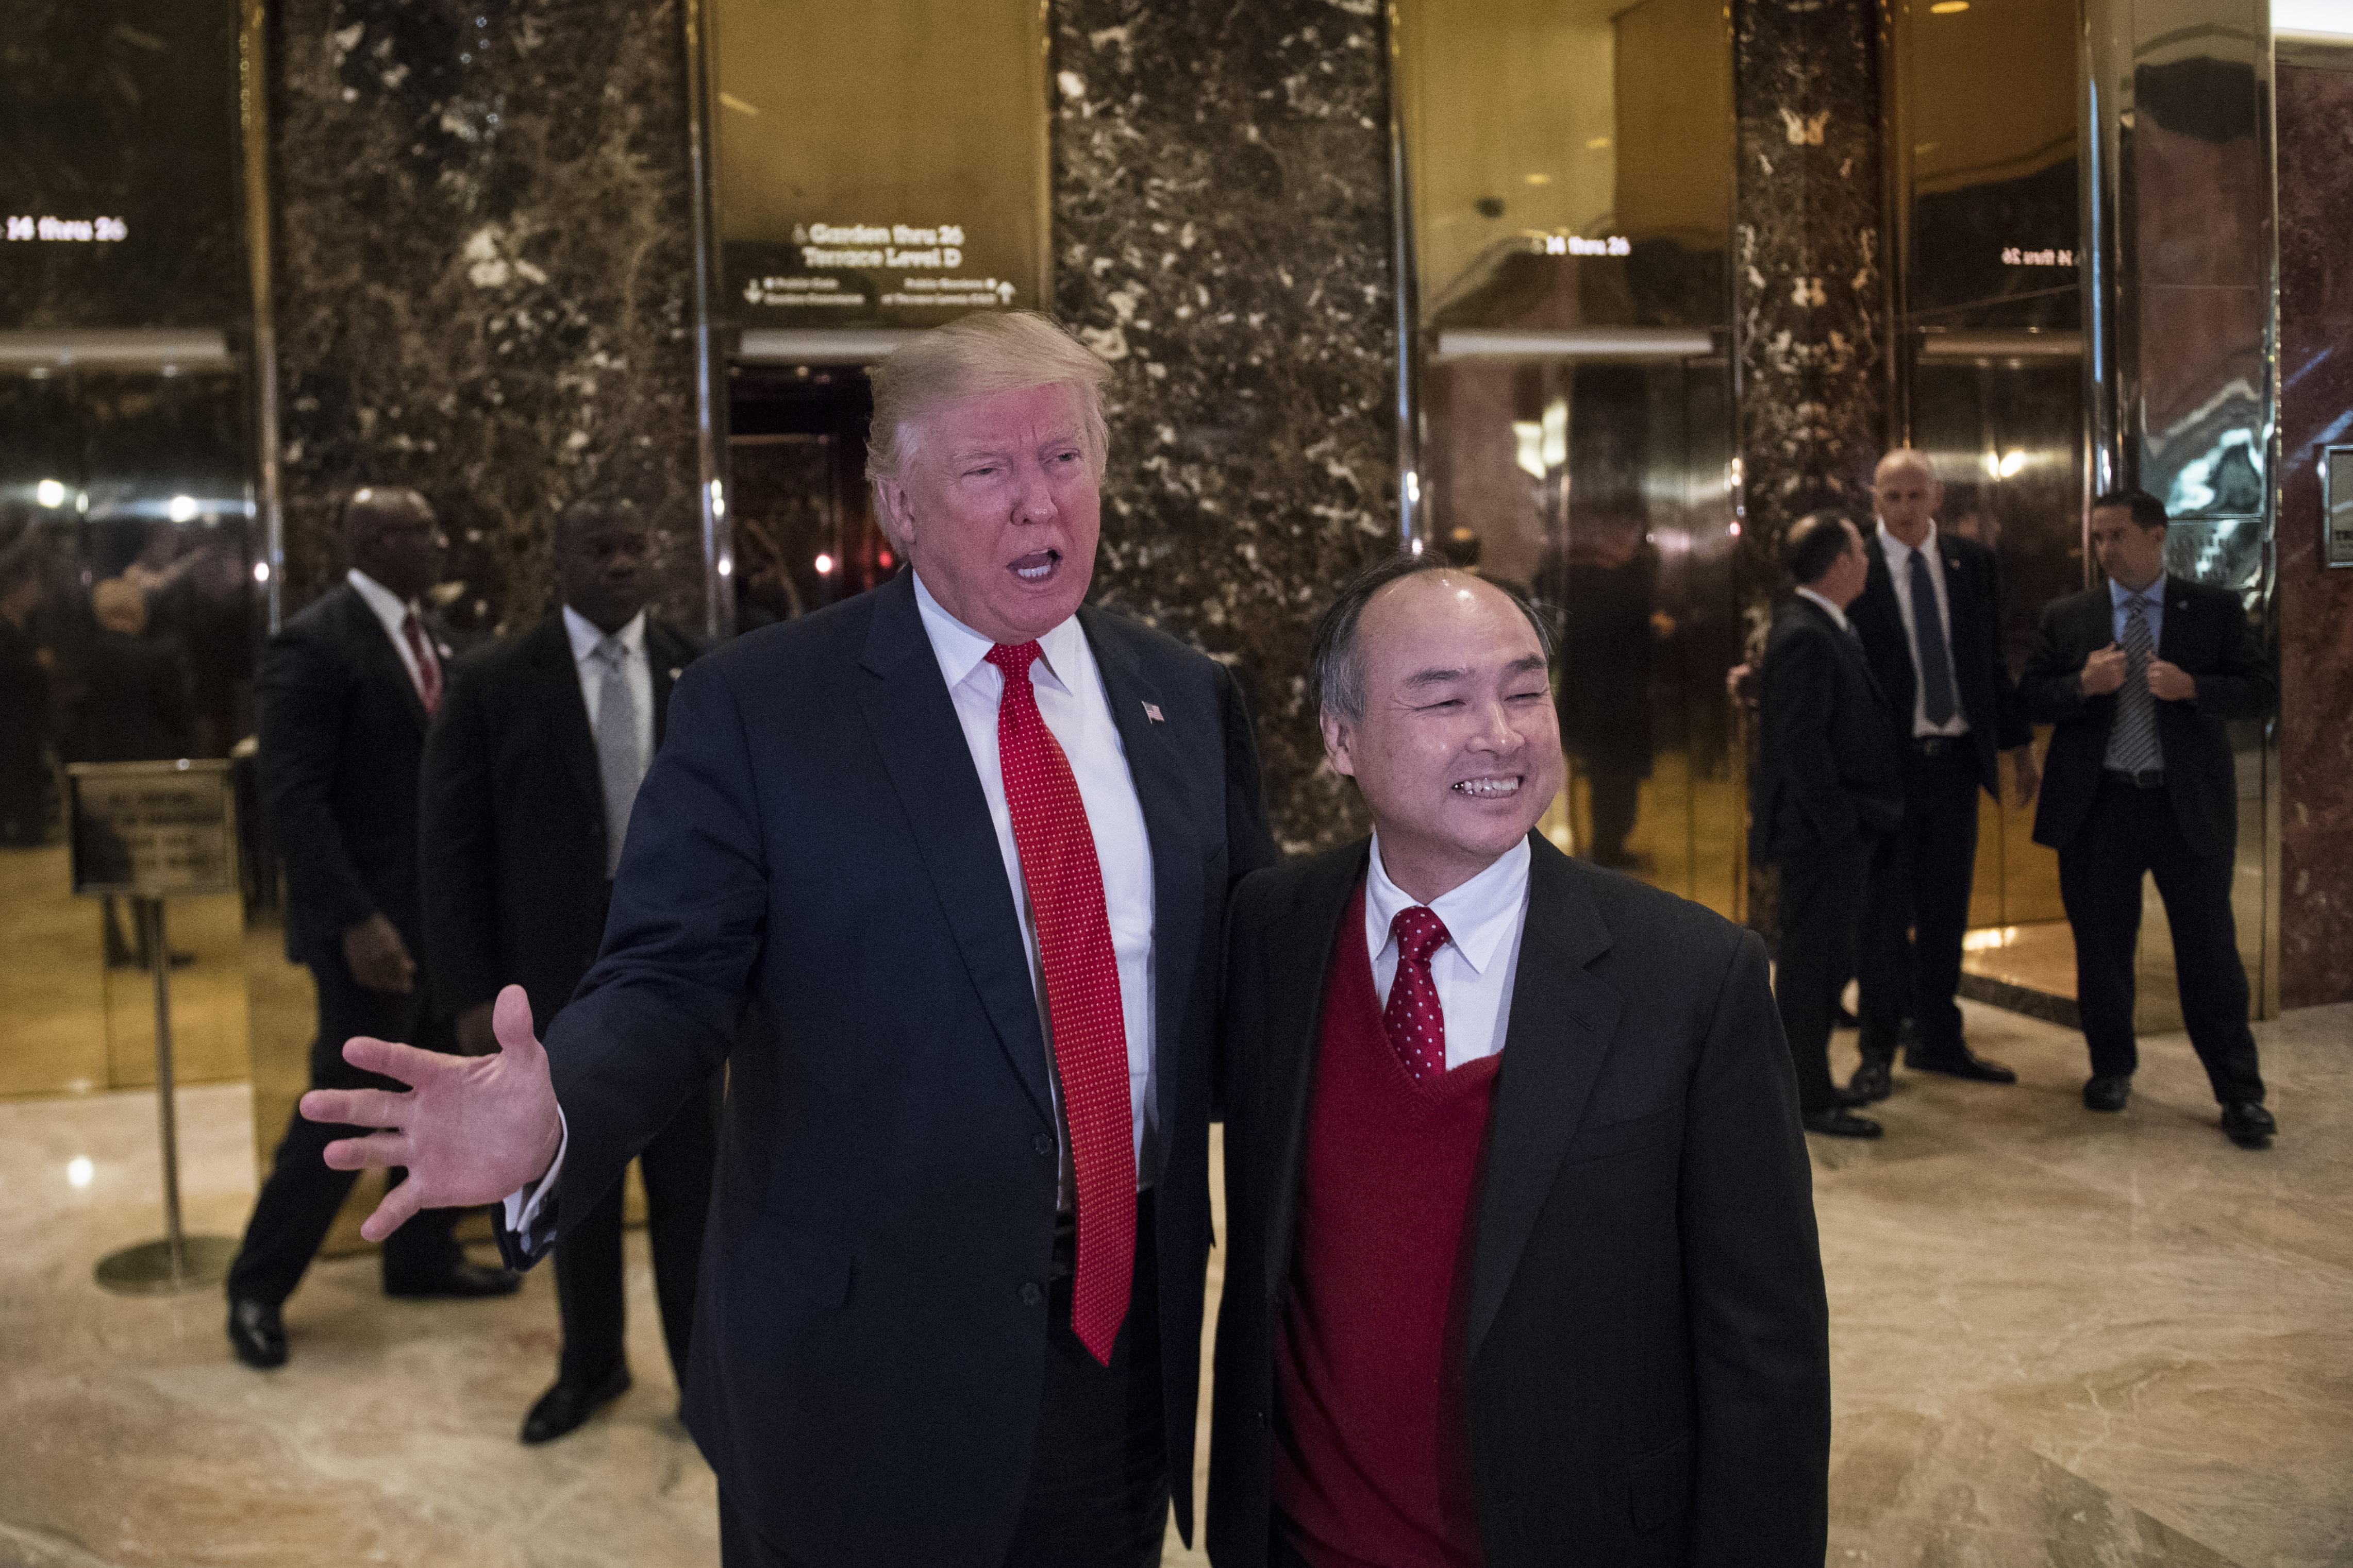 Republican presidential-elect Donald Trump